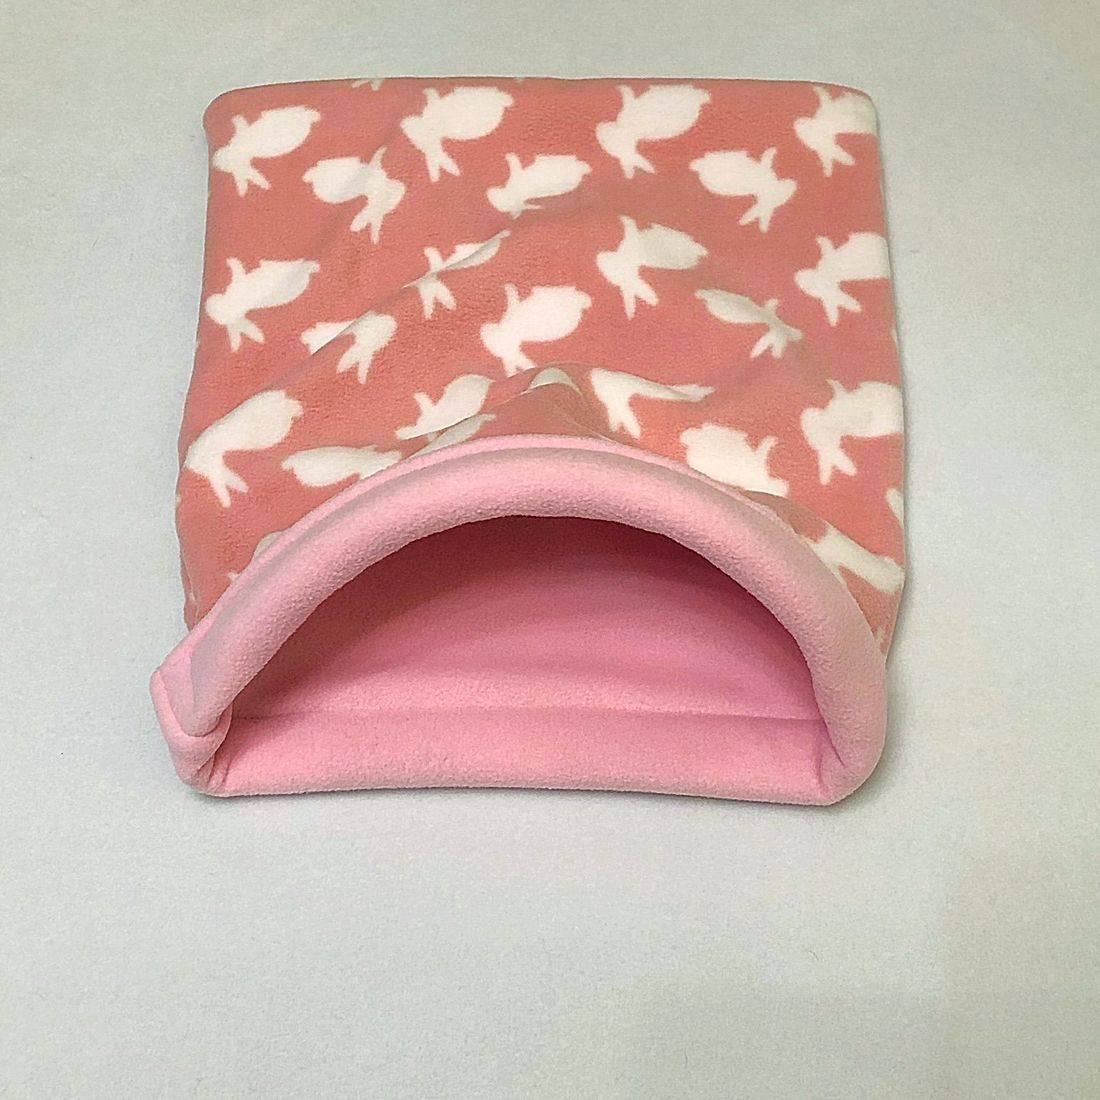 Flamingo piggie tunnel in Cream & rose pink